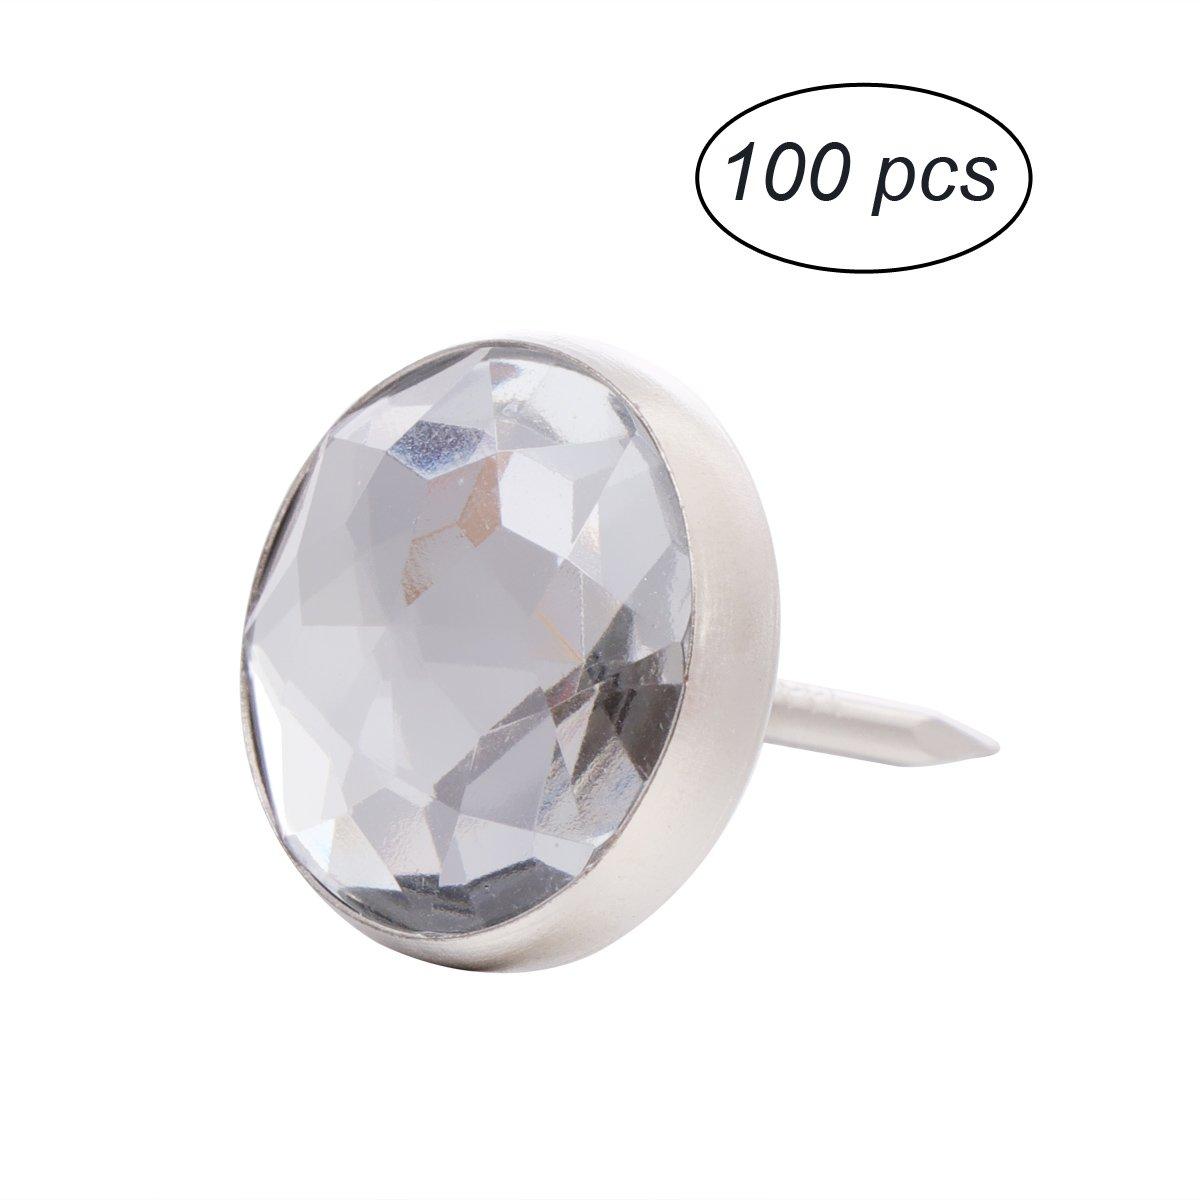 ROSENICE Crystal Head Push Pins Sofa Headboard Upholstery Nails Buttons Tacks 100pcs